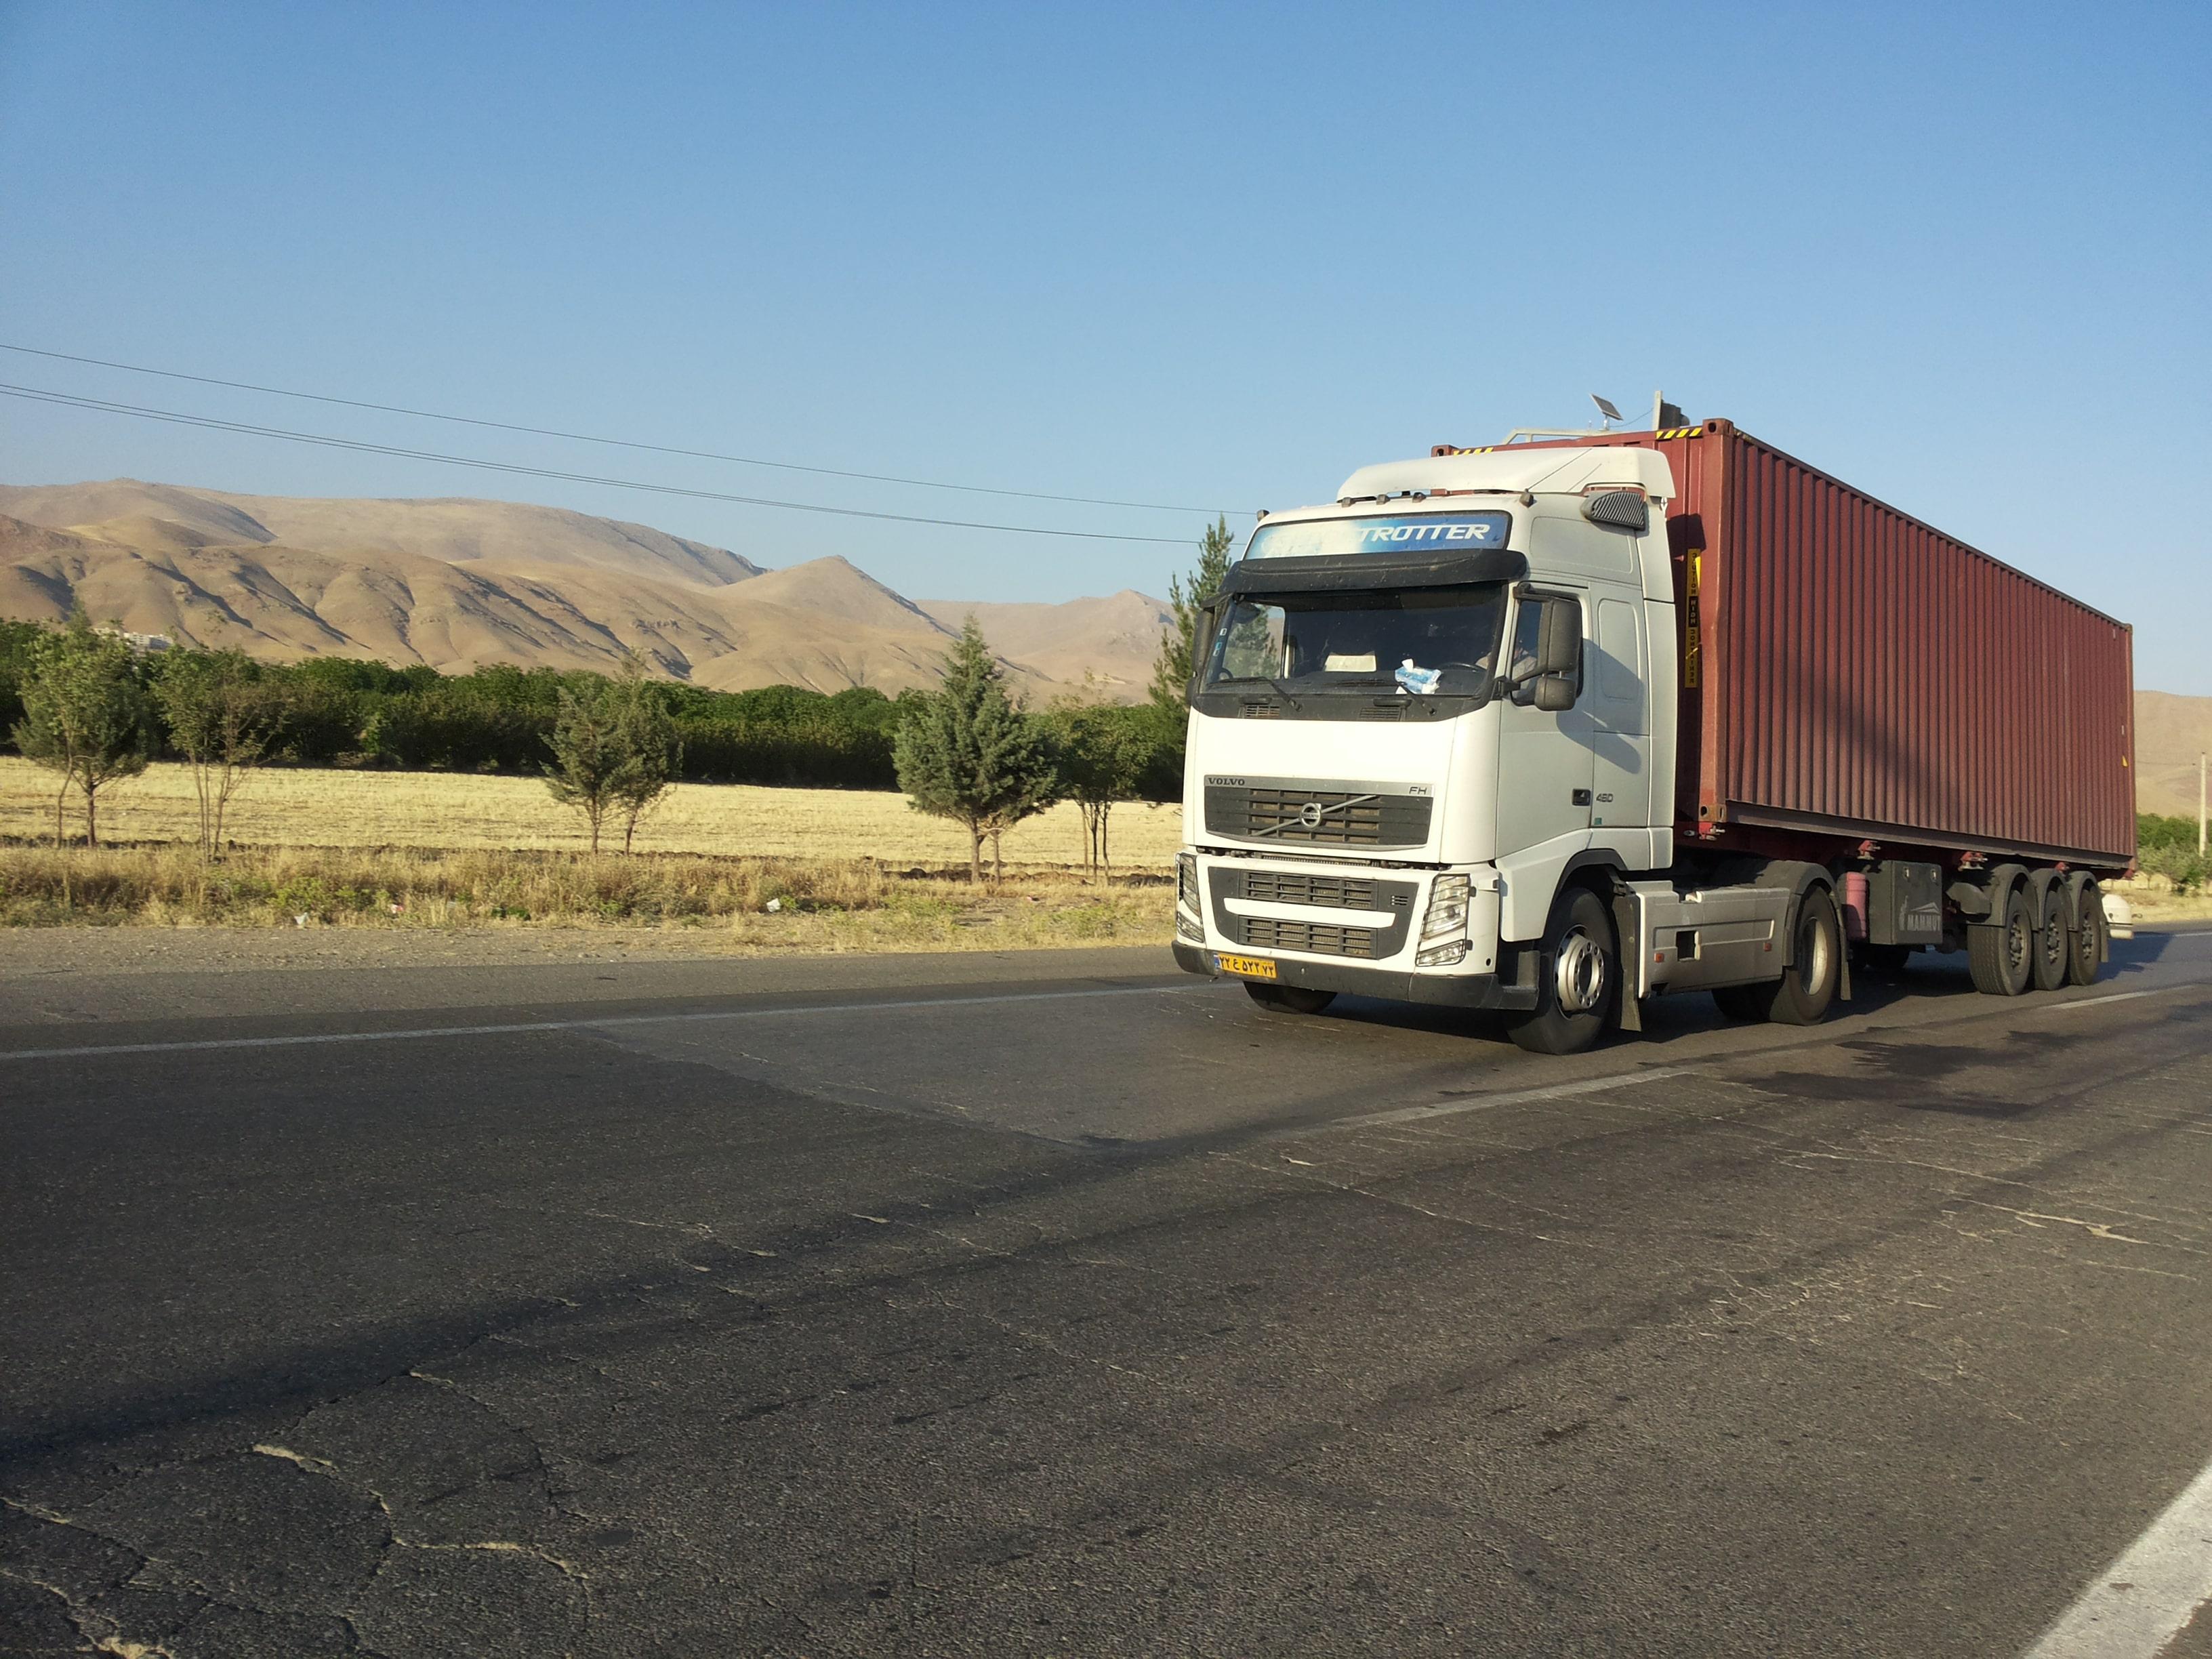 1 min 1 - مشکل ناوگانهای چادردار(کامیون ترانزیت)